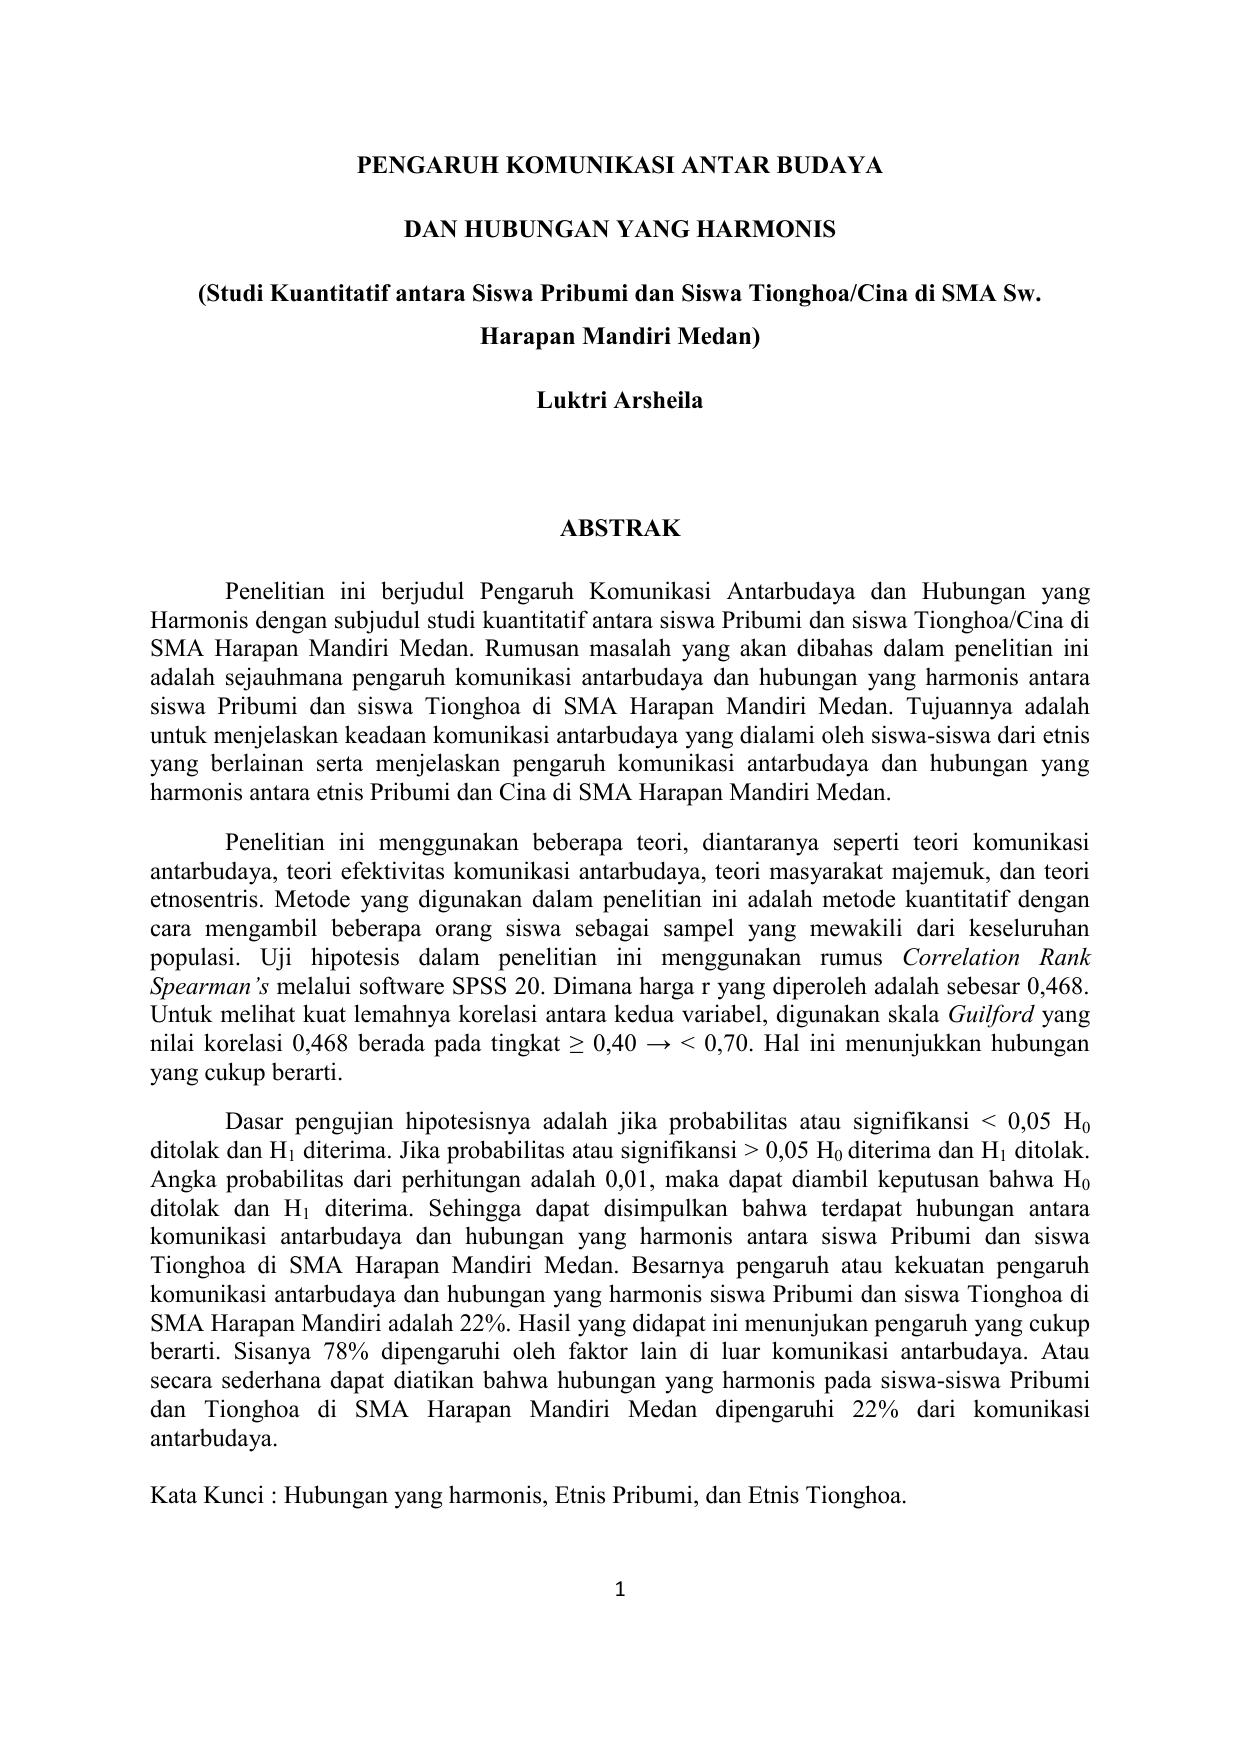 Doc Contoh Proposal Penelitian Kualitatif Budaya Komunikasi Masyarakat Madura Studi Pada Komunitas Madura Di Desa Karang Geger Kecamatan Pajarakan Hadi Nata Academia Edu